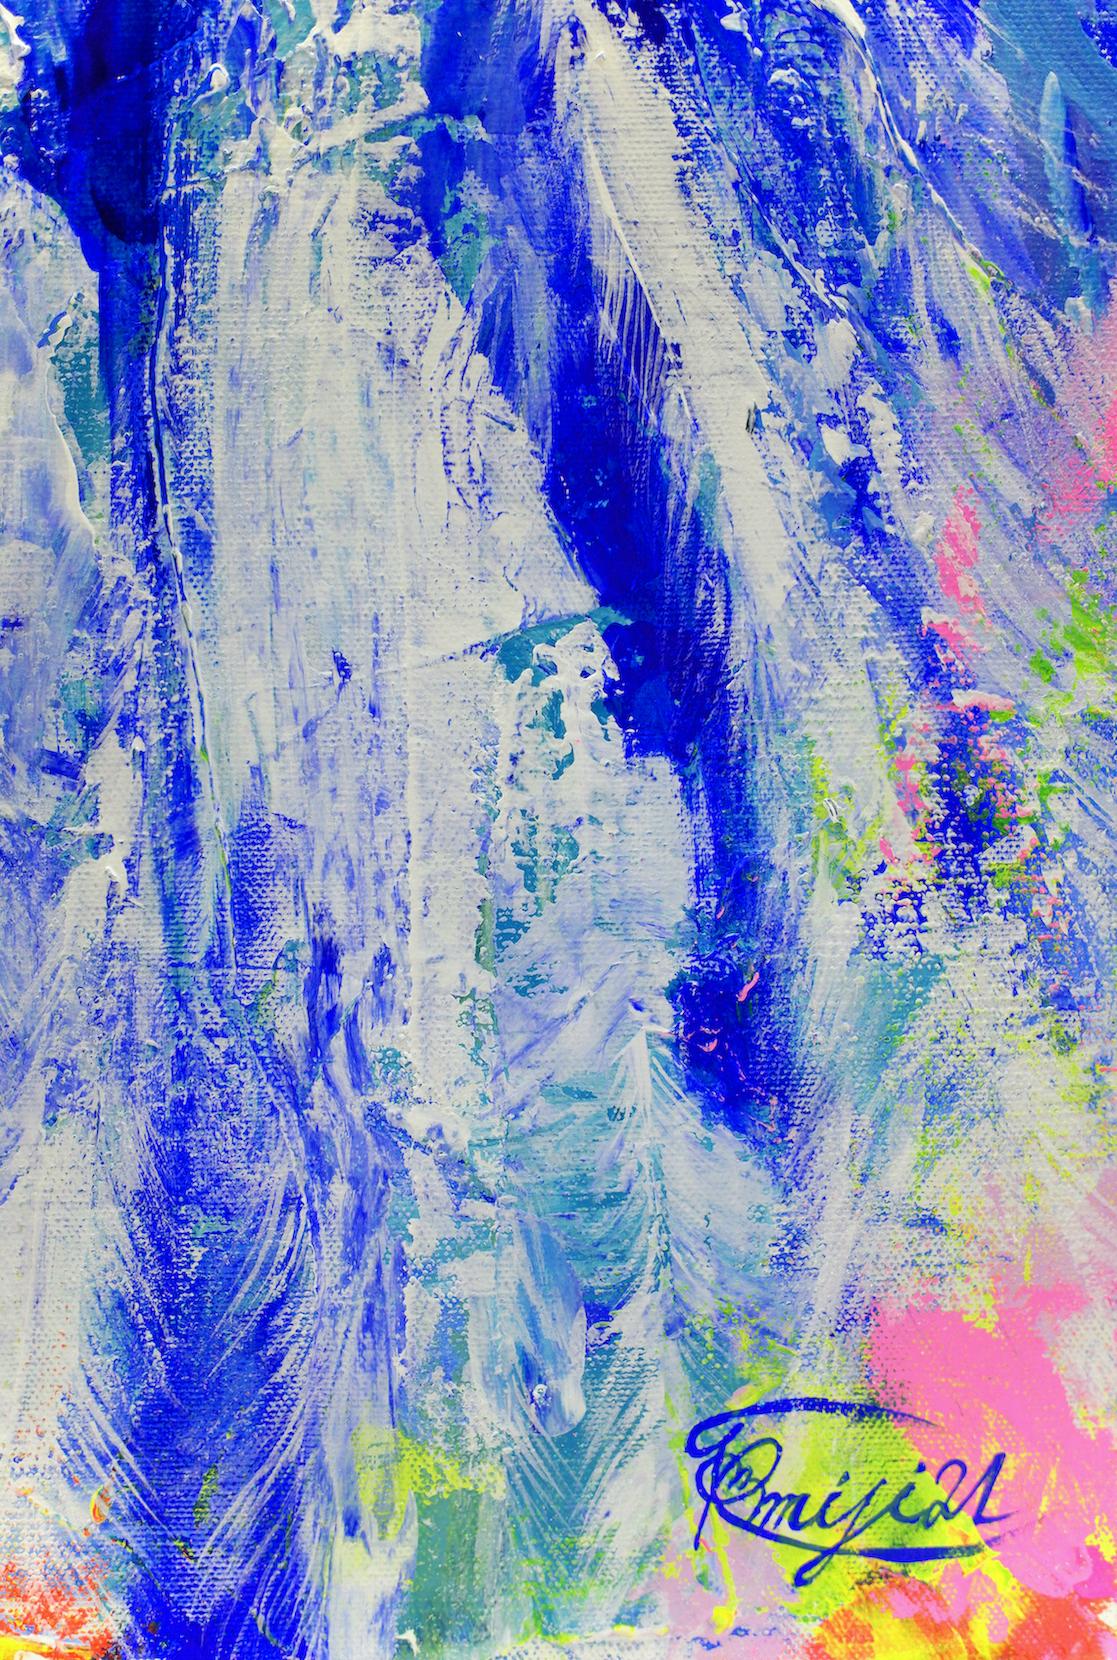 『 La vie joyeuse 』acrylic, mixed-media on canvas (60.6cm×50.0cm/F12)